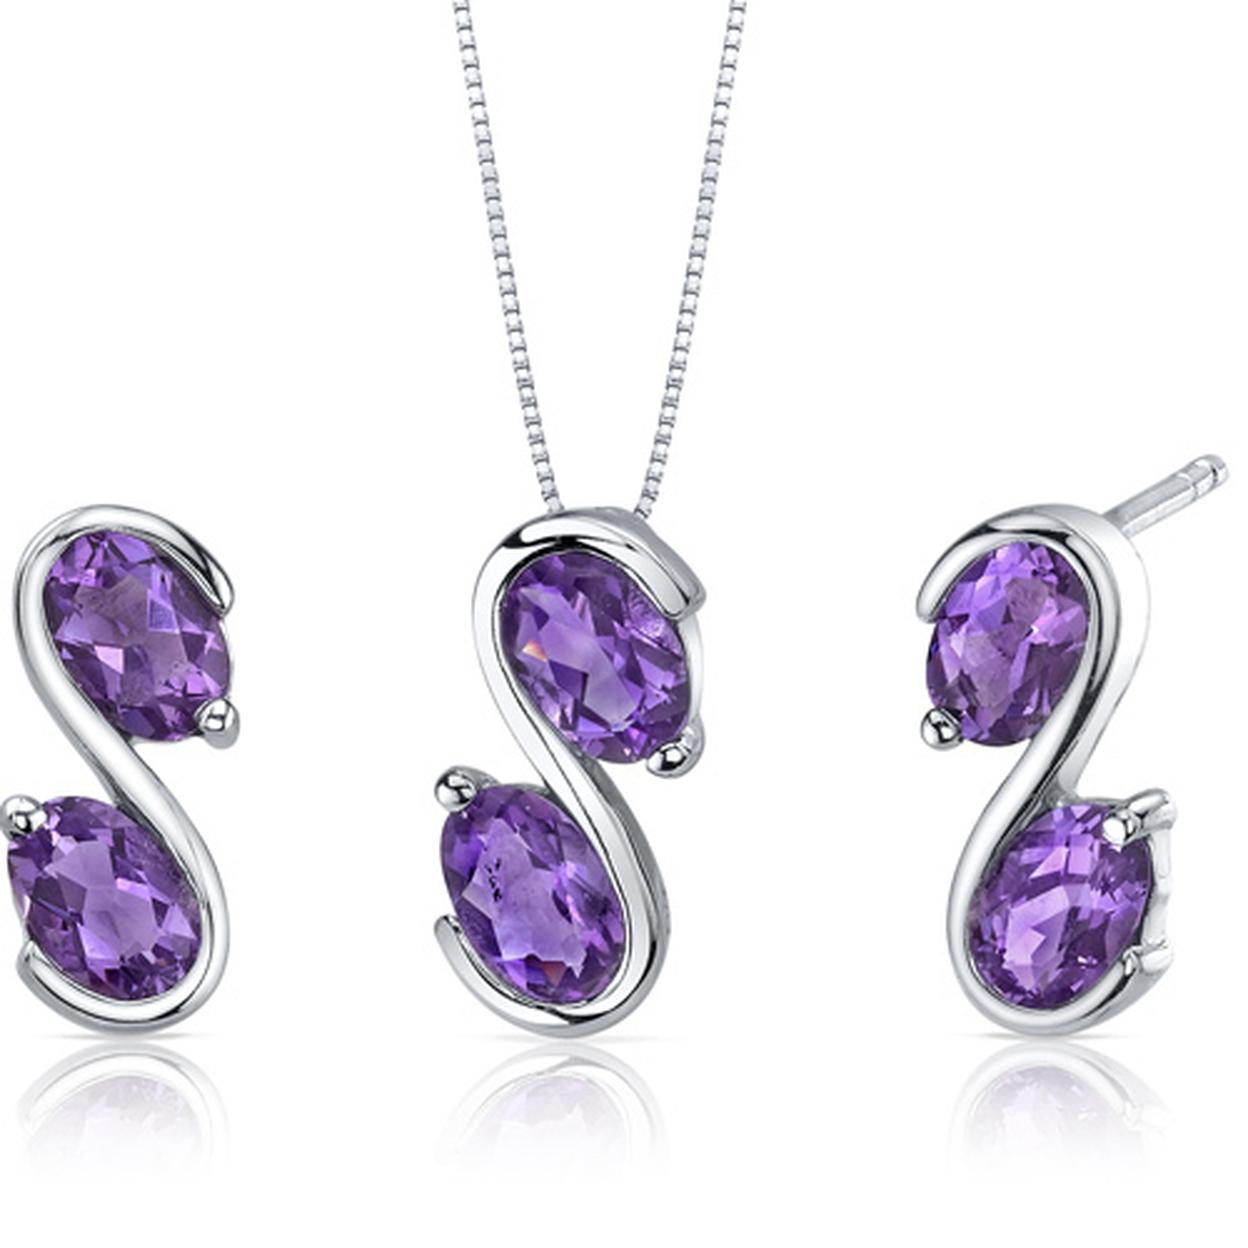 Graceful Elegance 3.00 Carats Oval Cut Sterling Silver Amethyst Pendant Earrings Set Style Ss3628